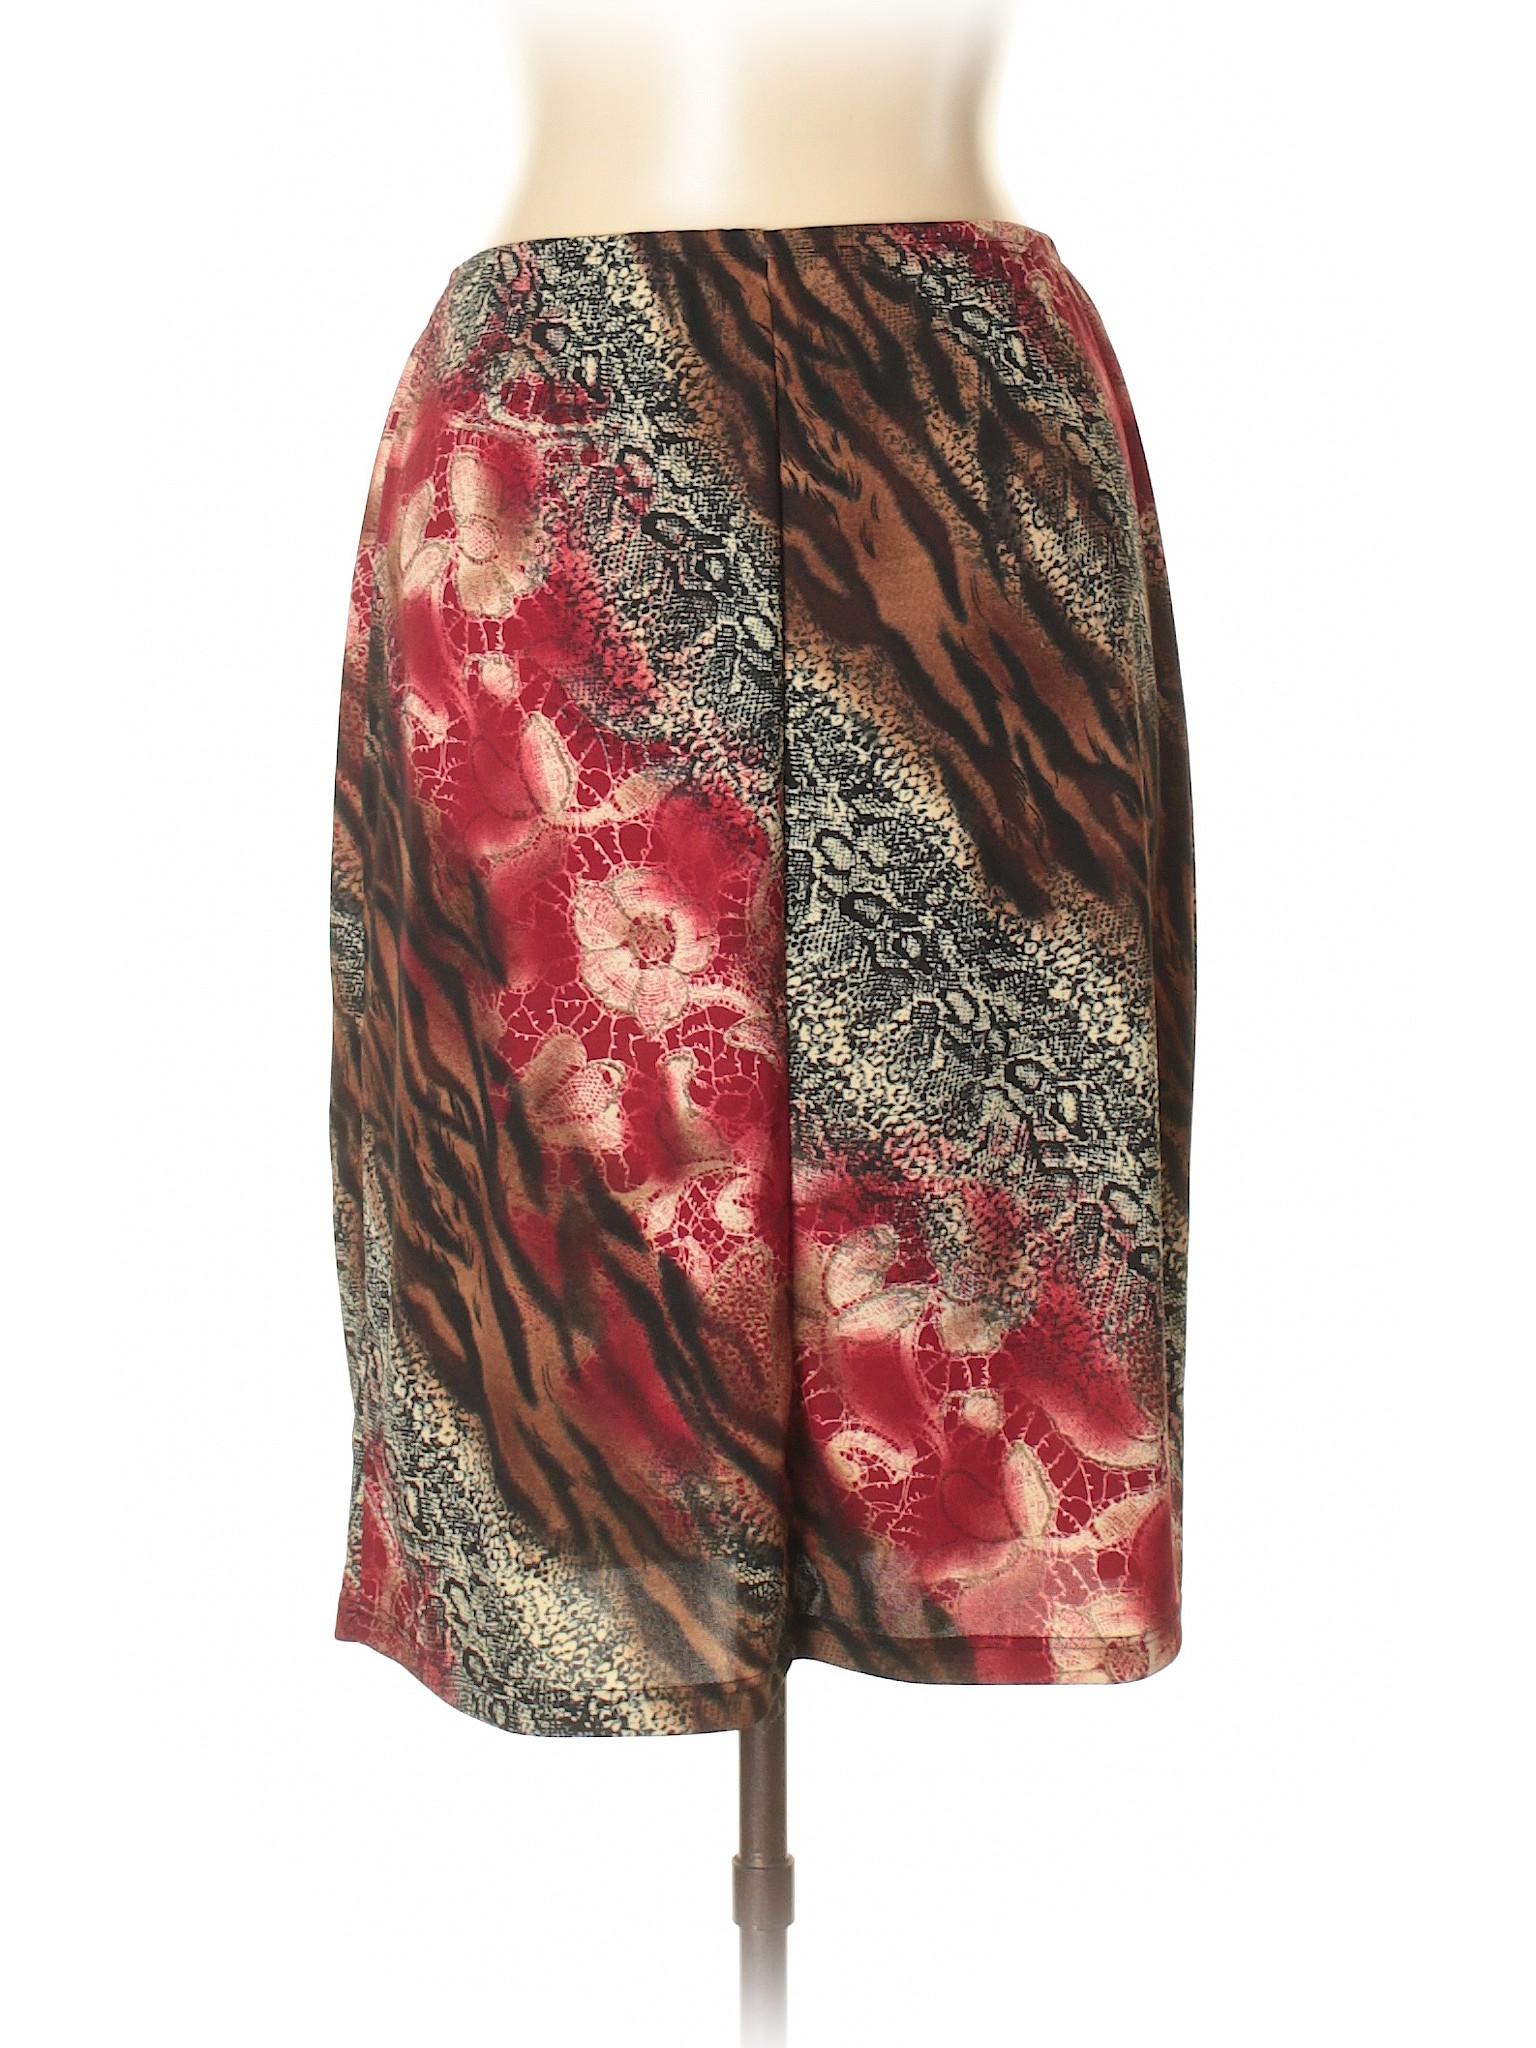 Skirt Boutique Boutique Boutique Casual Skirt Boutique Skirt Boutique Casual Casual Skirt Casual Casual Skirt Boutique Casual Skirt AHdqxzES